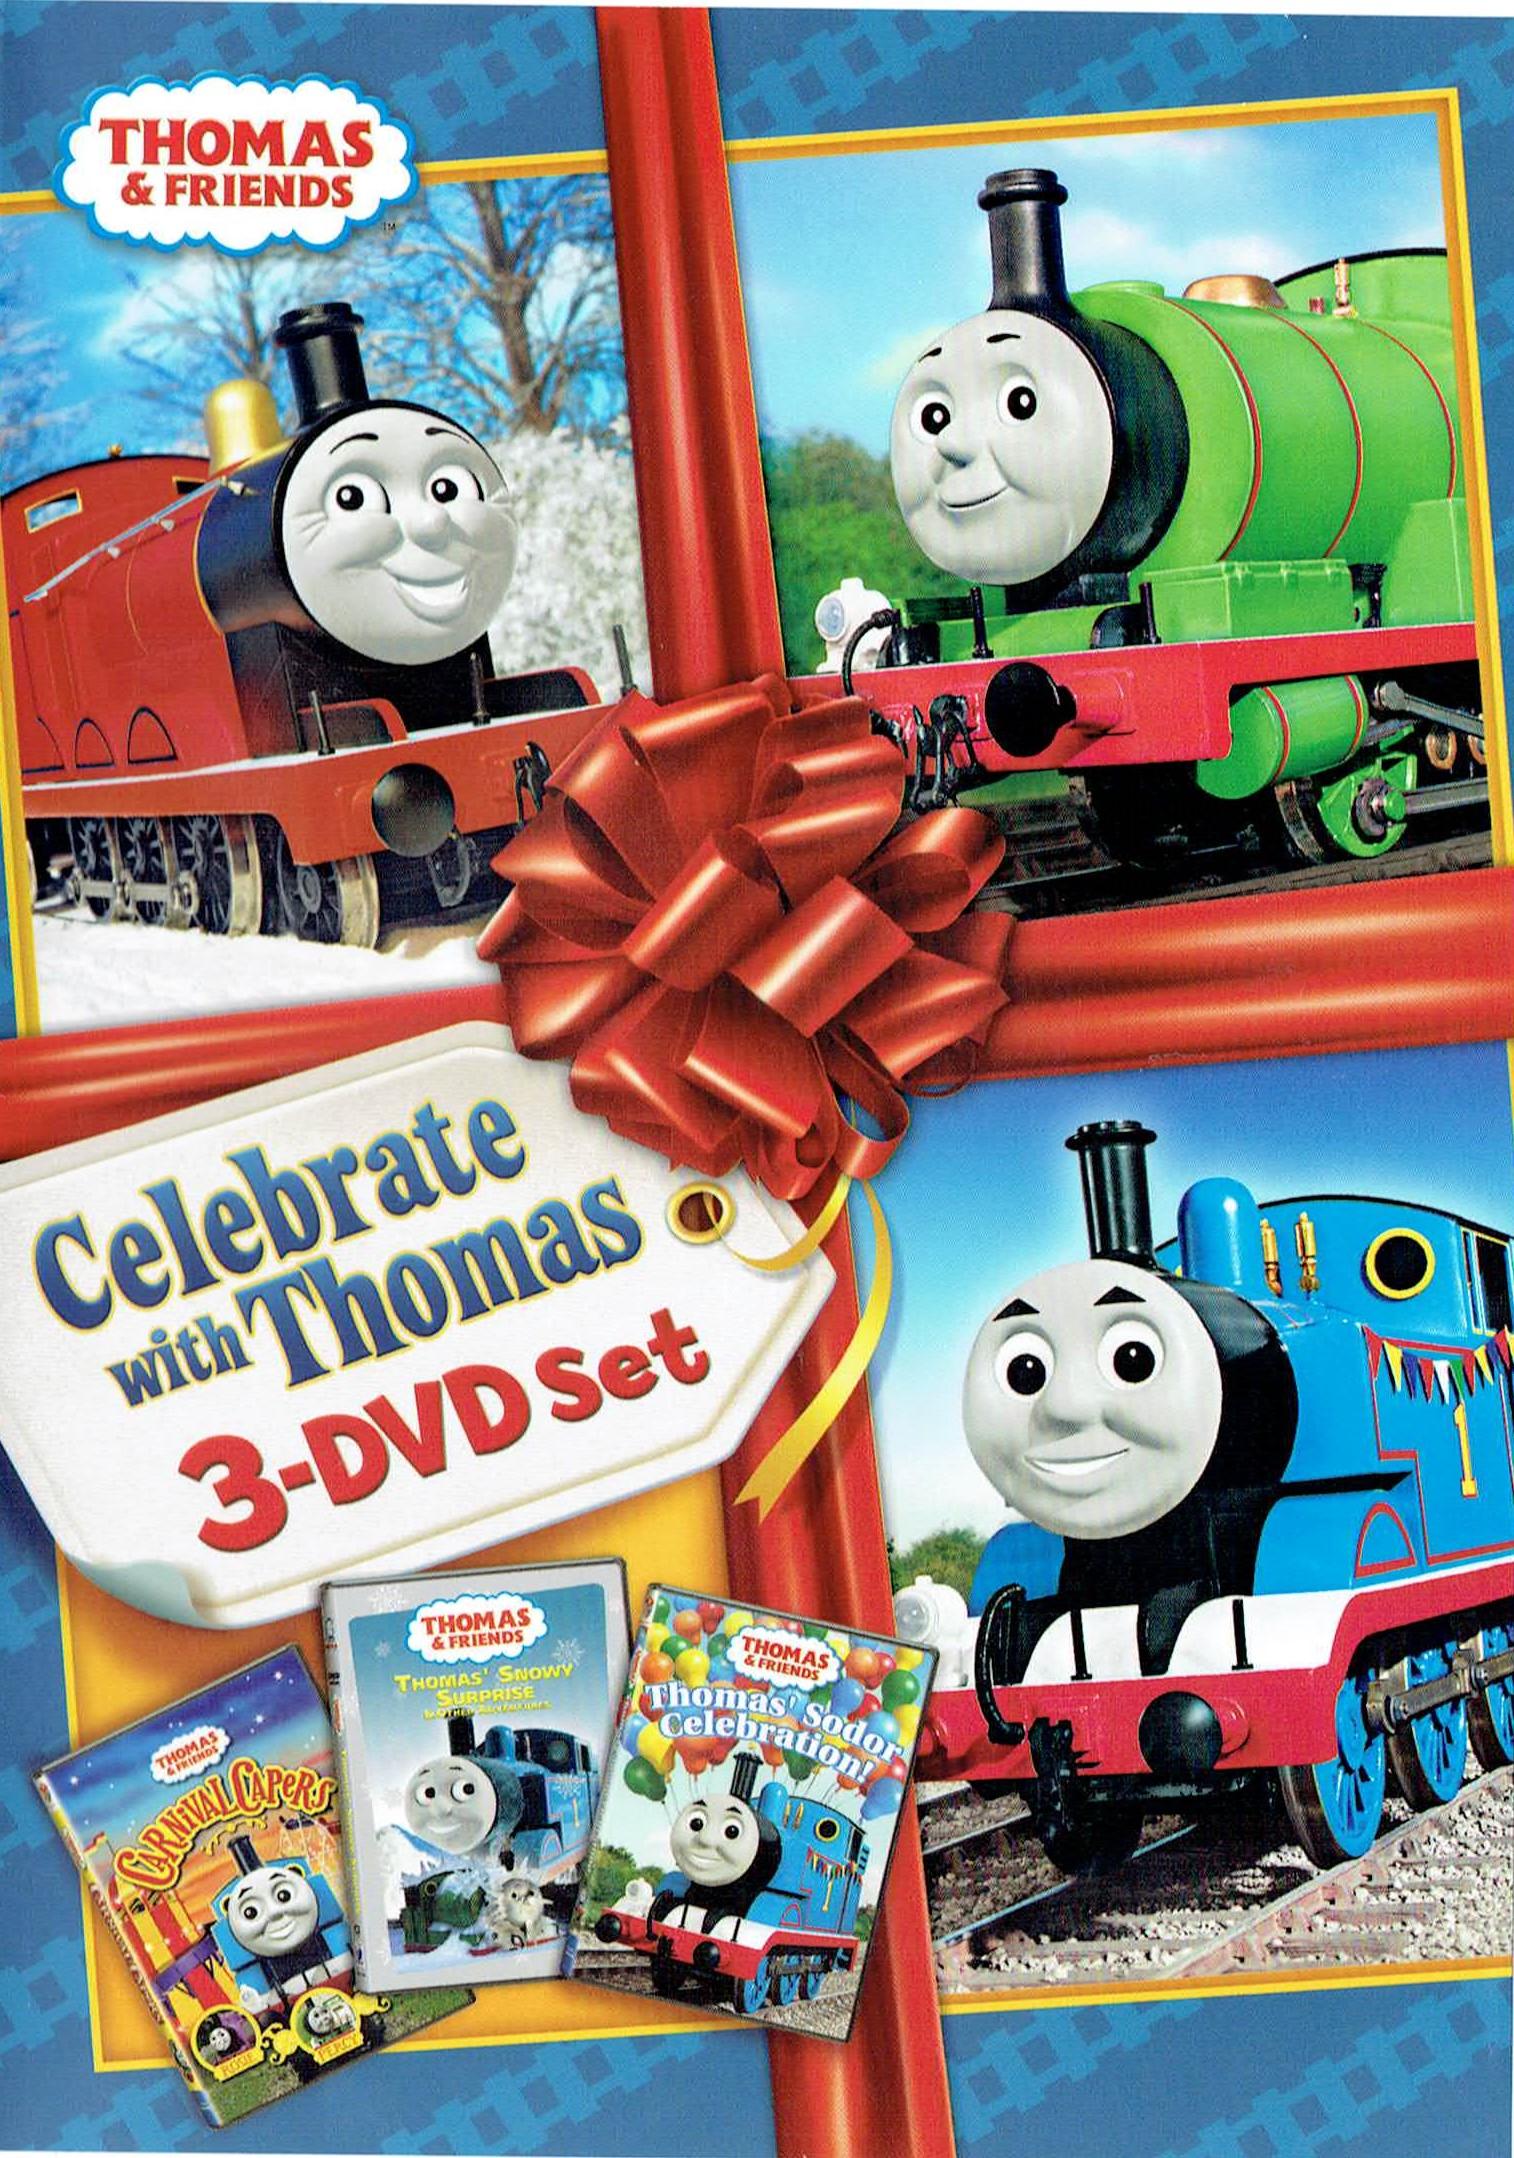 Celebrate with Thomas